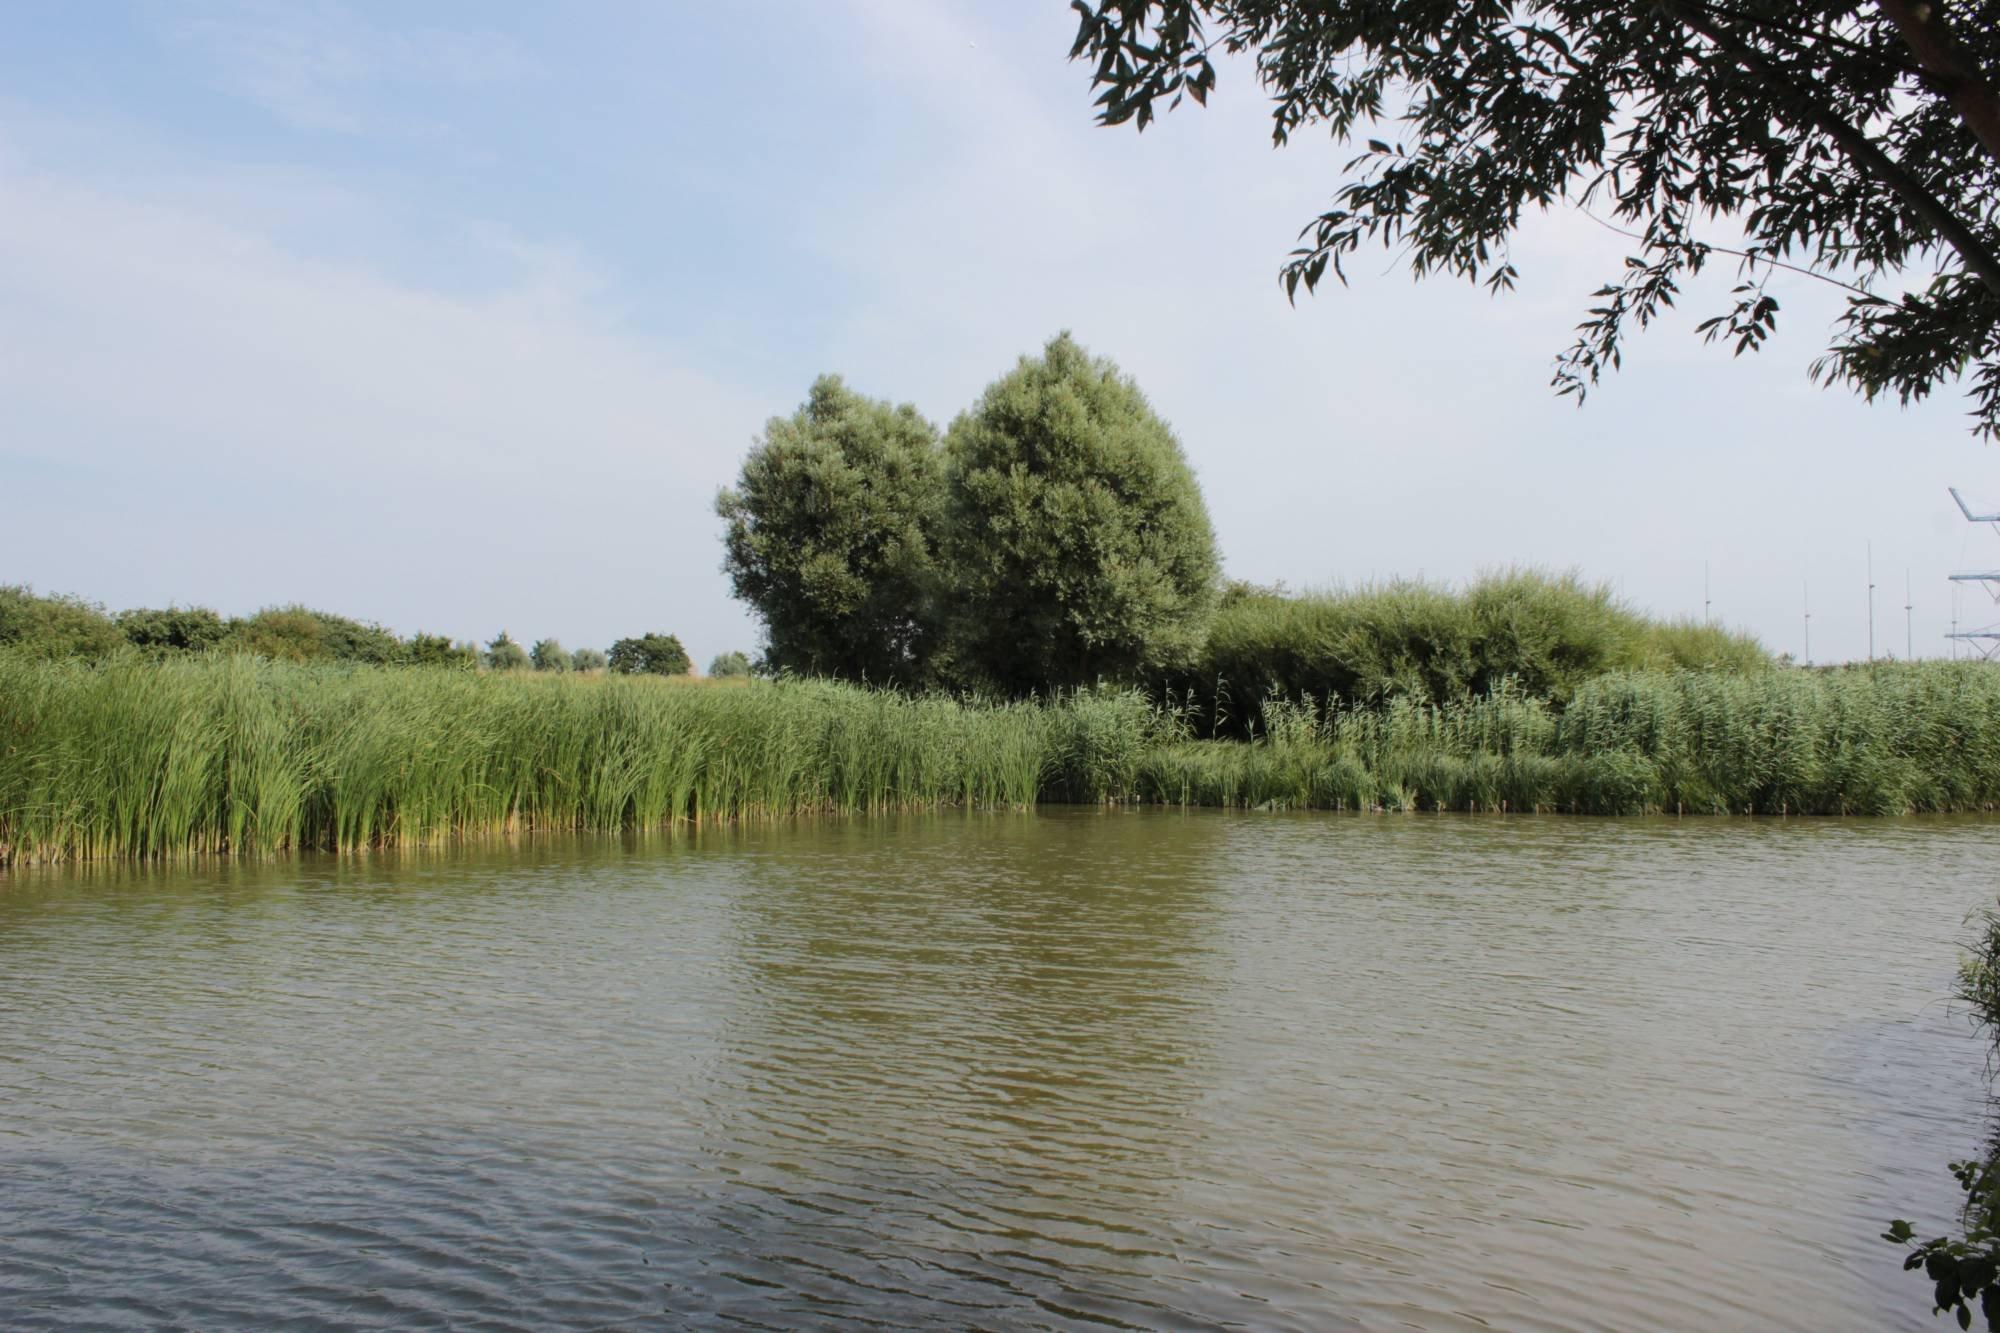 Waterbiesweg 46, The Hague